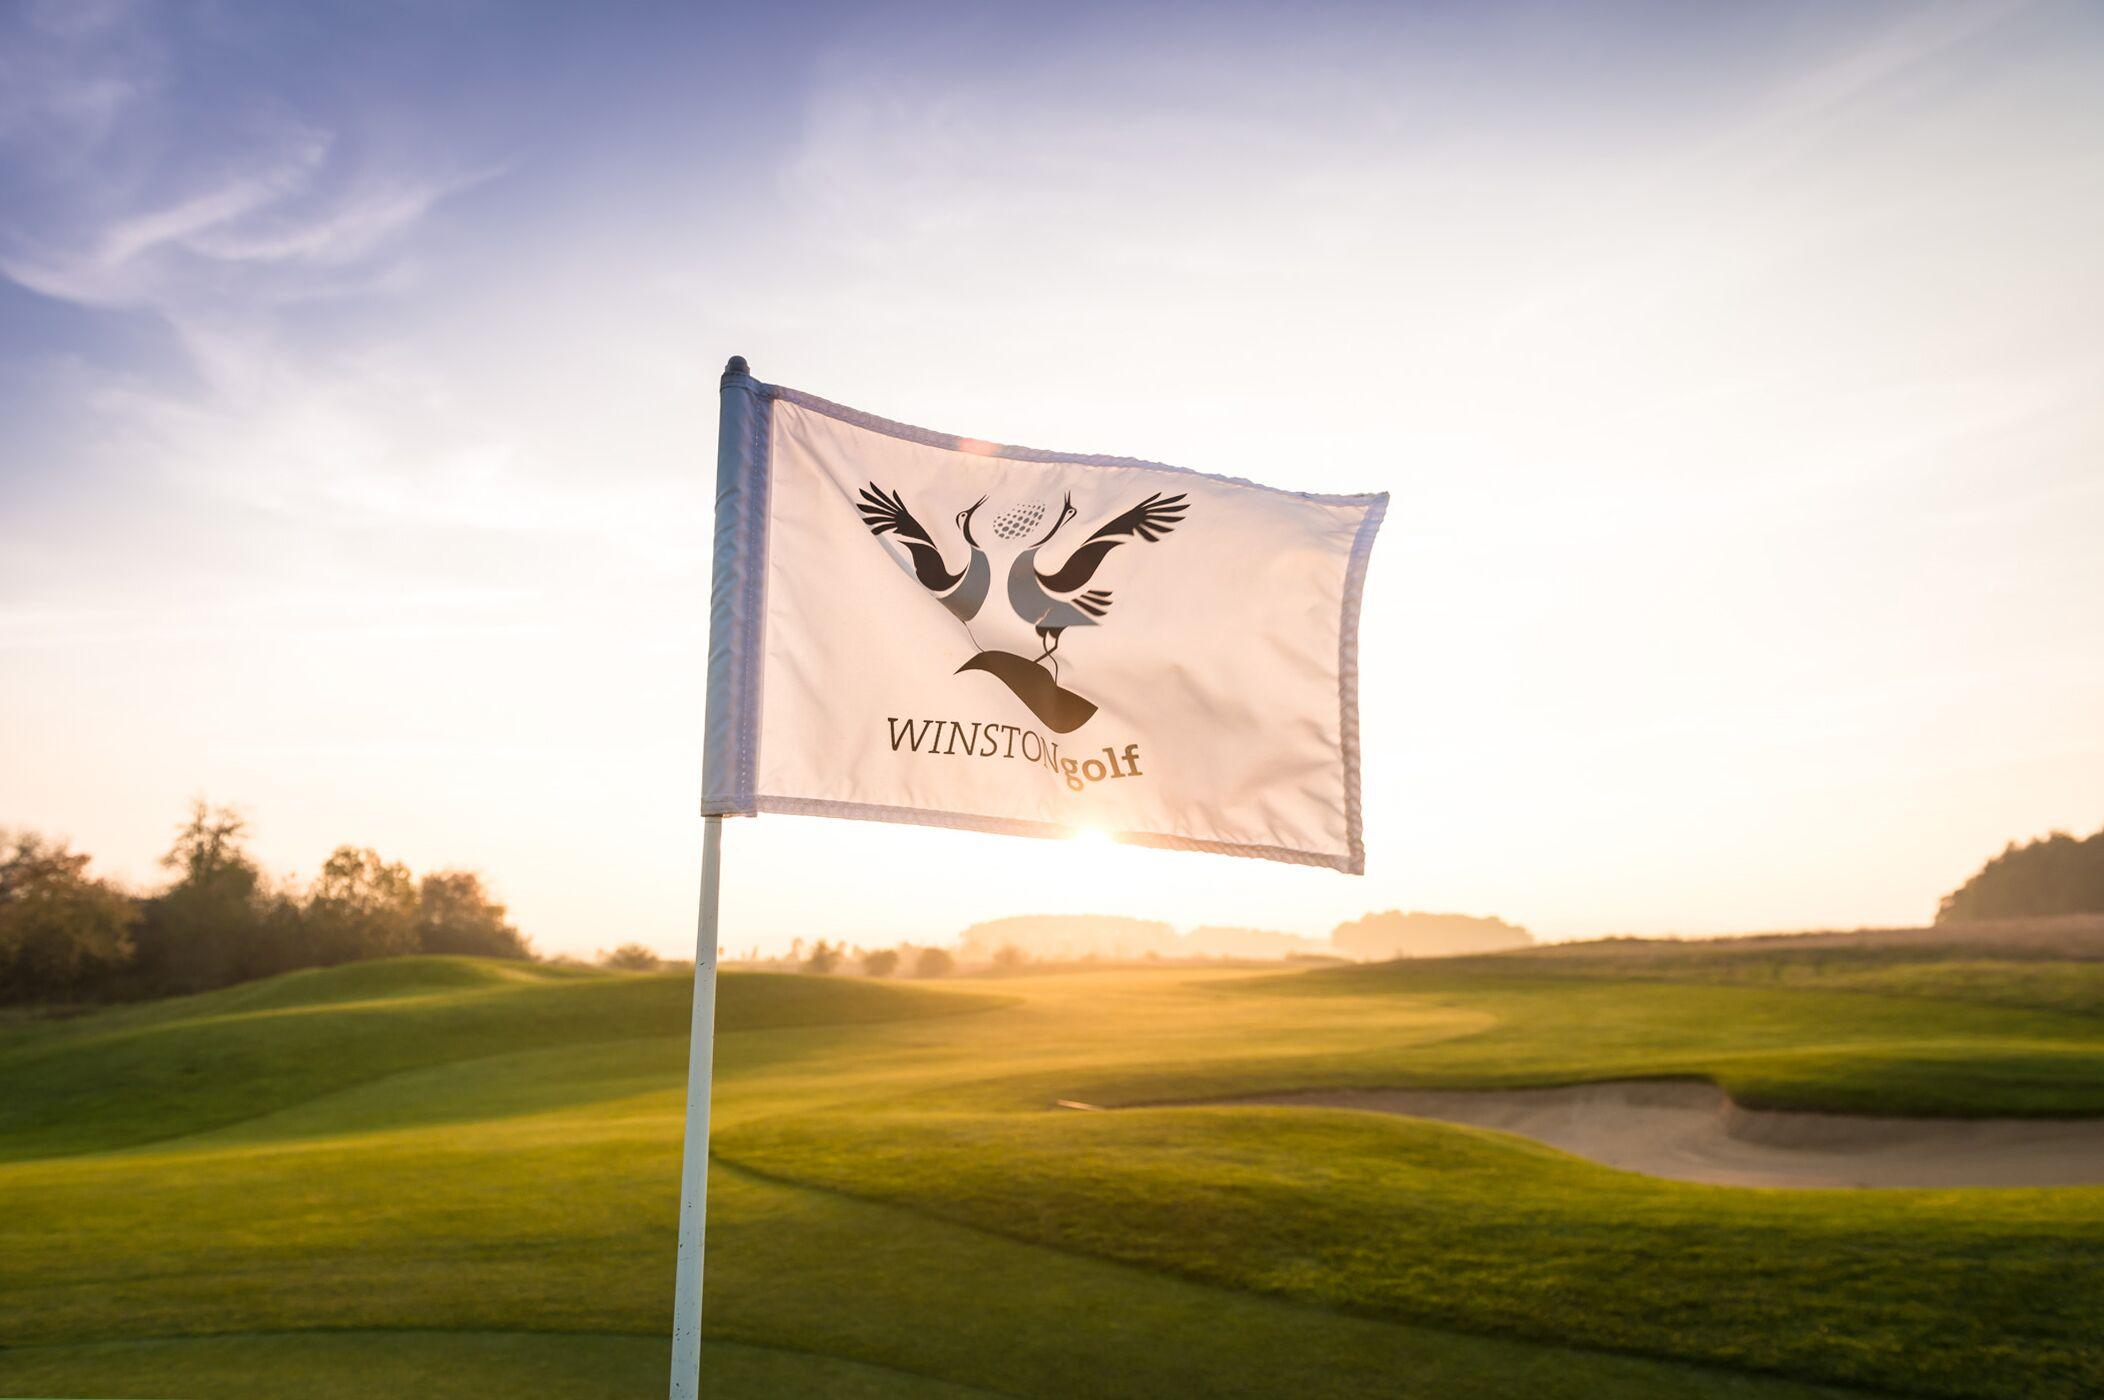 Gp winstongolf 18 j.lindeberg golfpunk tour big 5 week vom 6